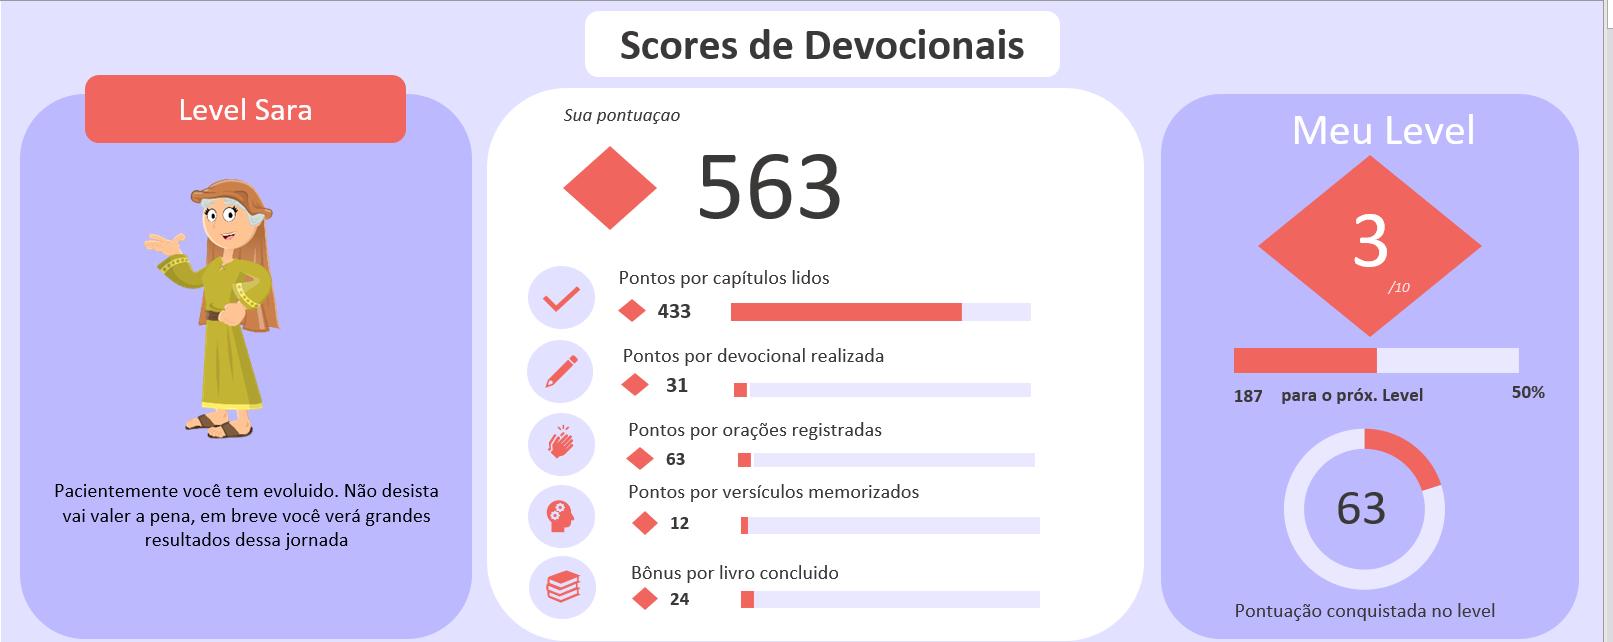 Score devocional